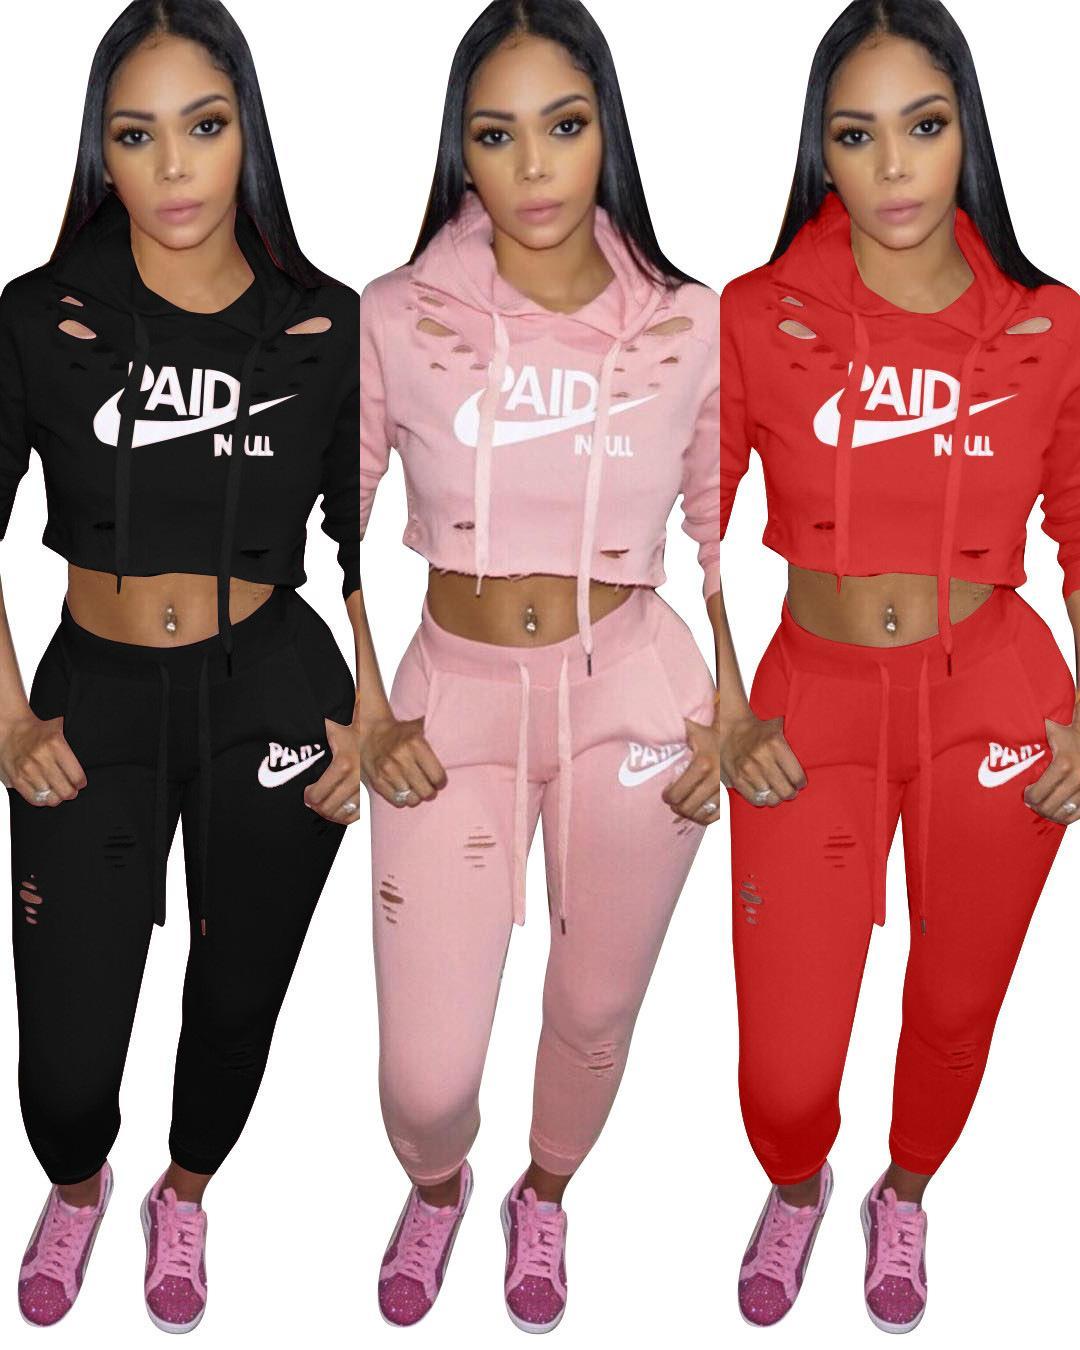 0c76cd947e 2018 Love Pink Letter Tracksuits Long Sleeve 2 PCS Sets Top Pants Ladies  Summer Casual Tracksuit Yoga Jogger Suit WG0077